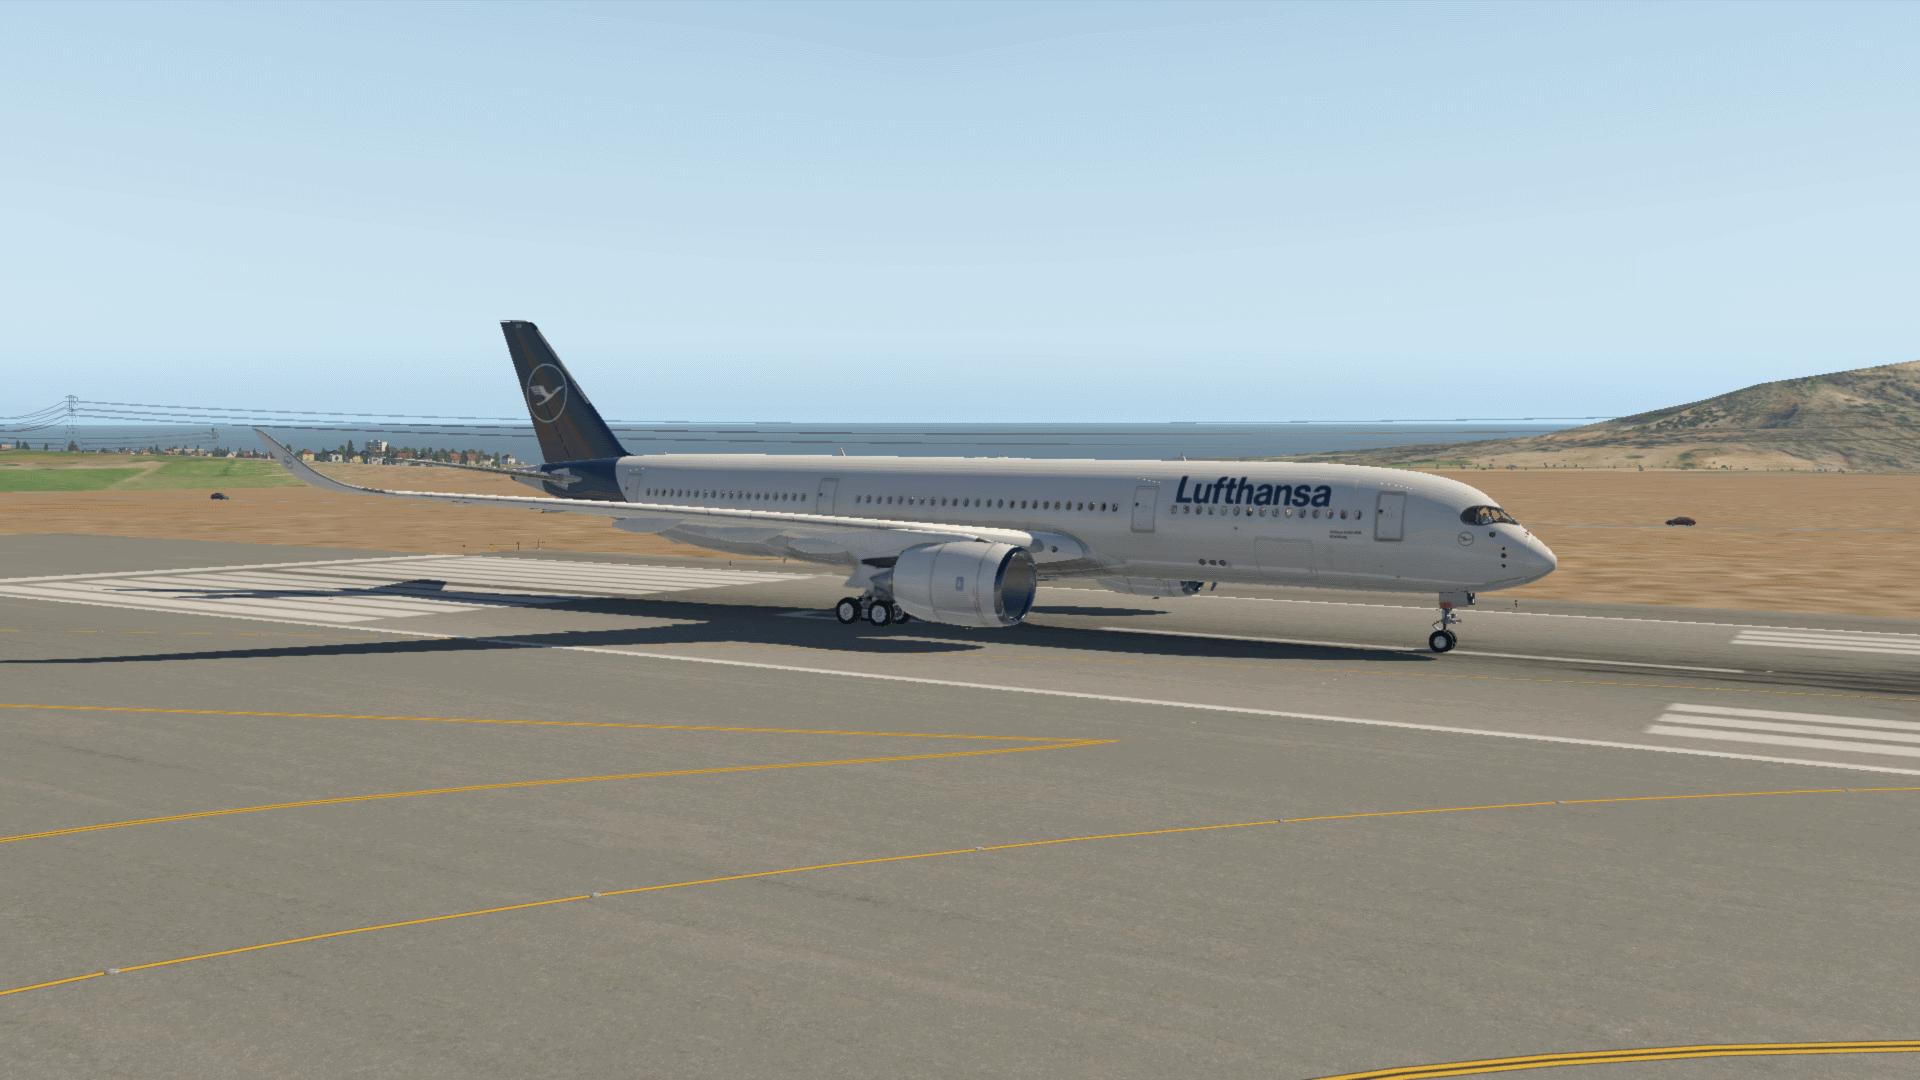 Lufthansa Airbus A350 D-AIXA - NEW LIVERY! - Aircraft Skins